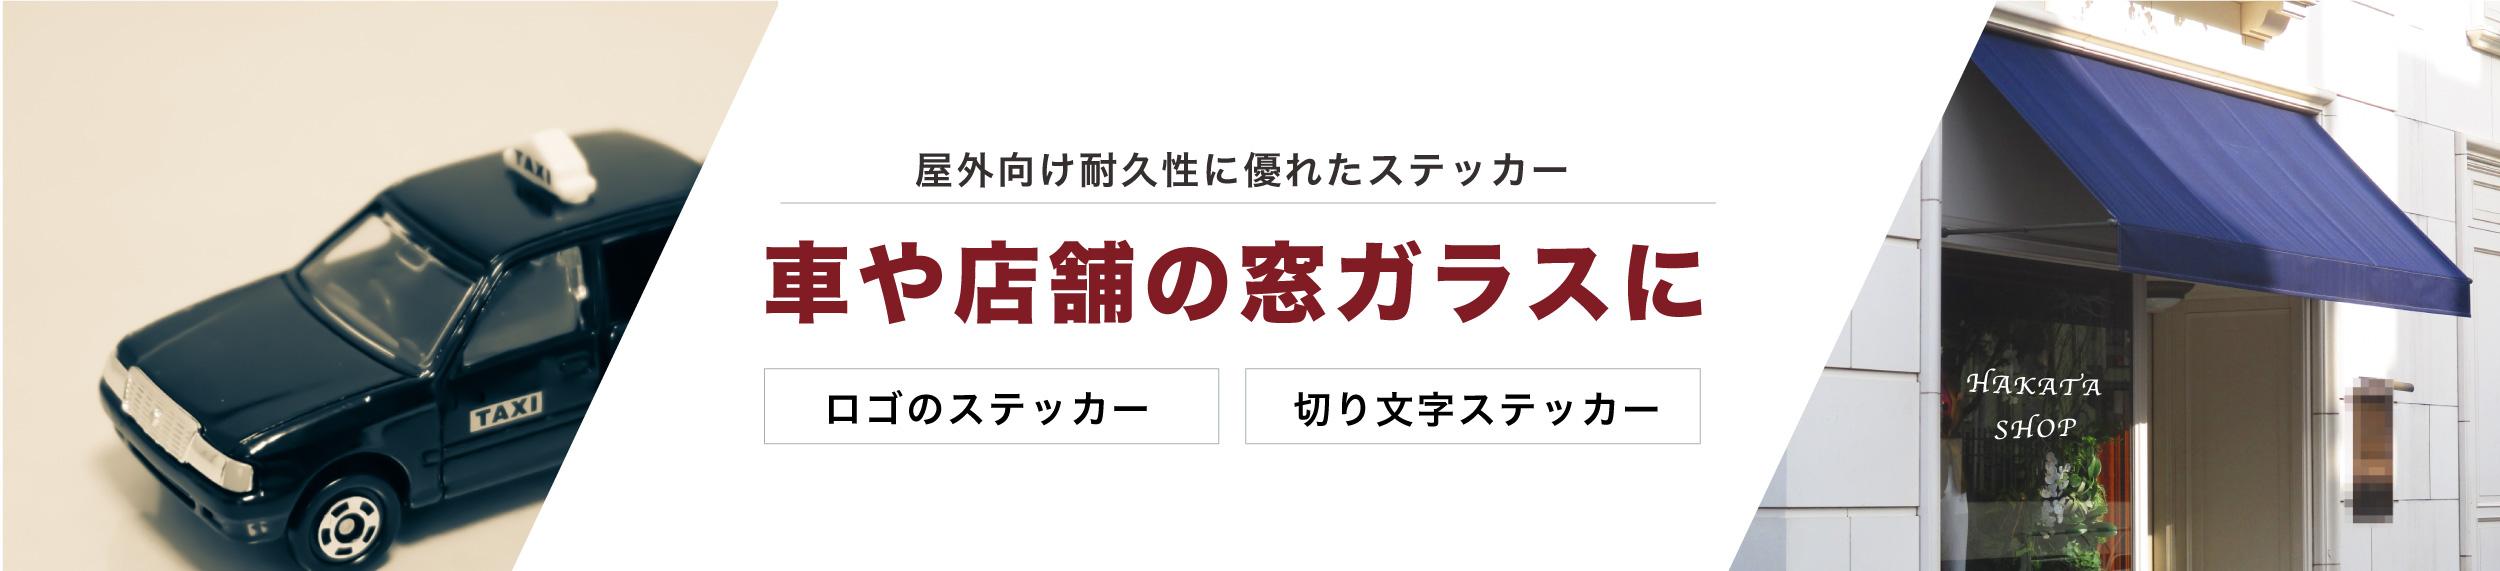 pc_header2